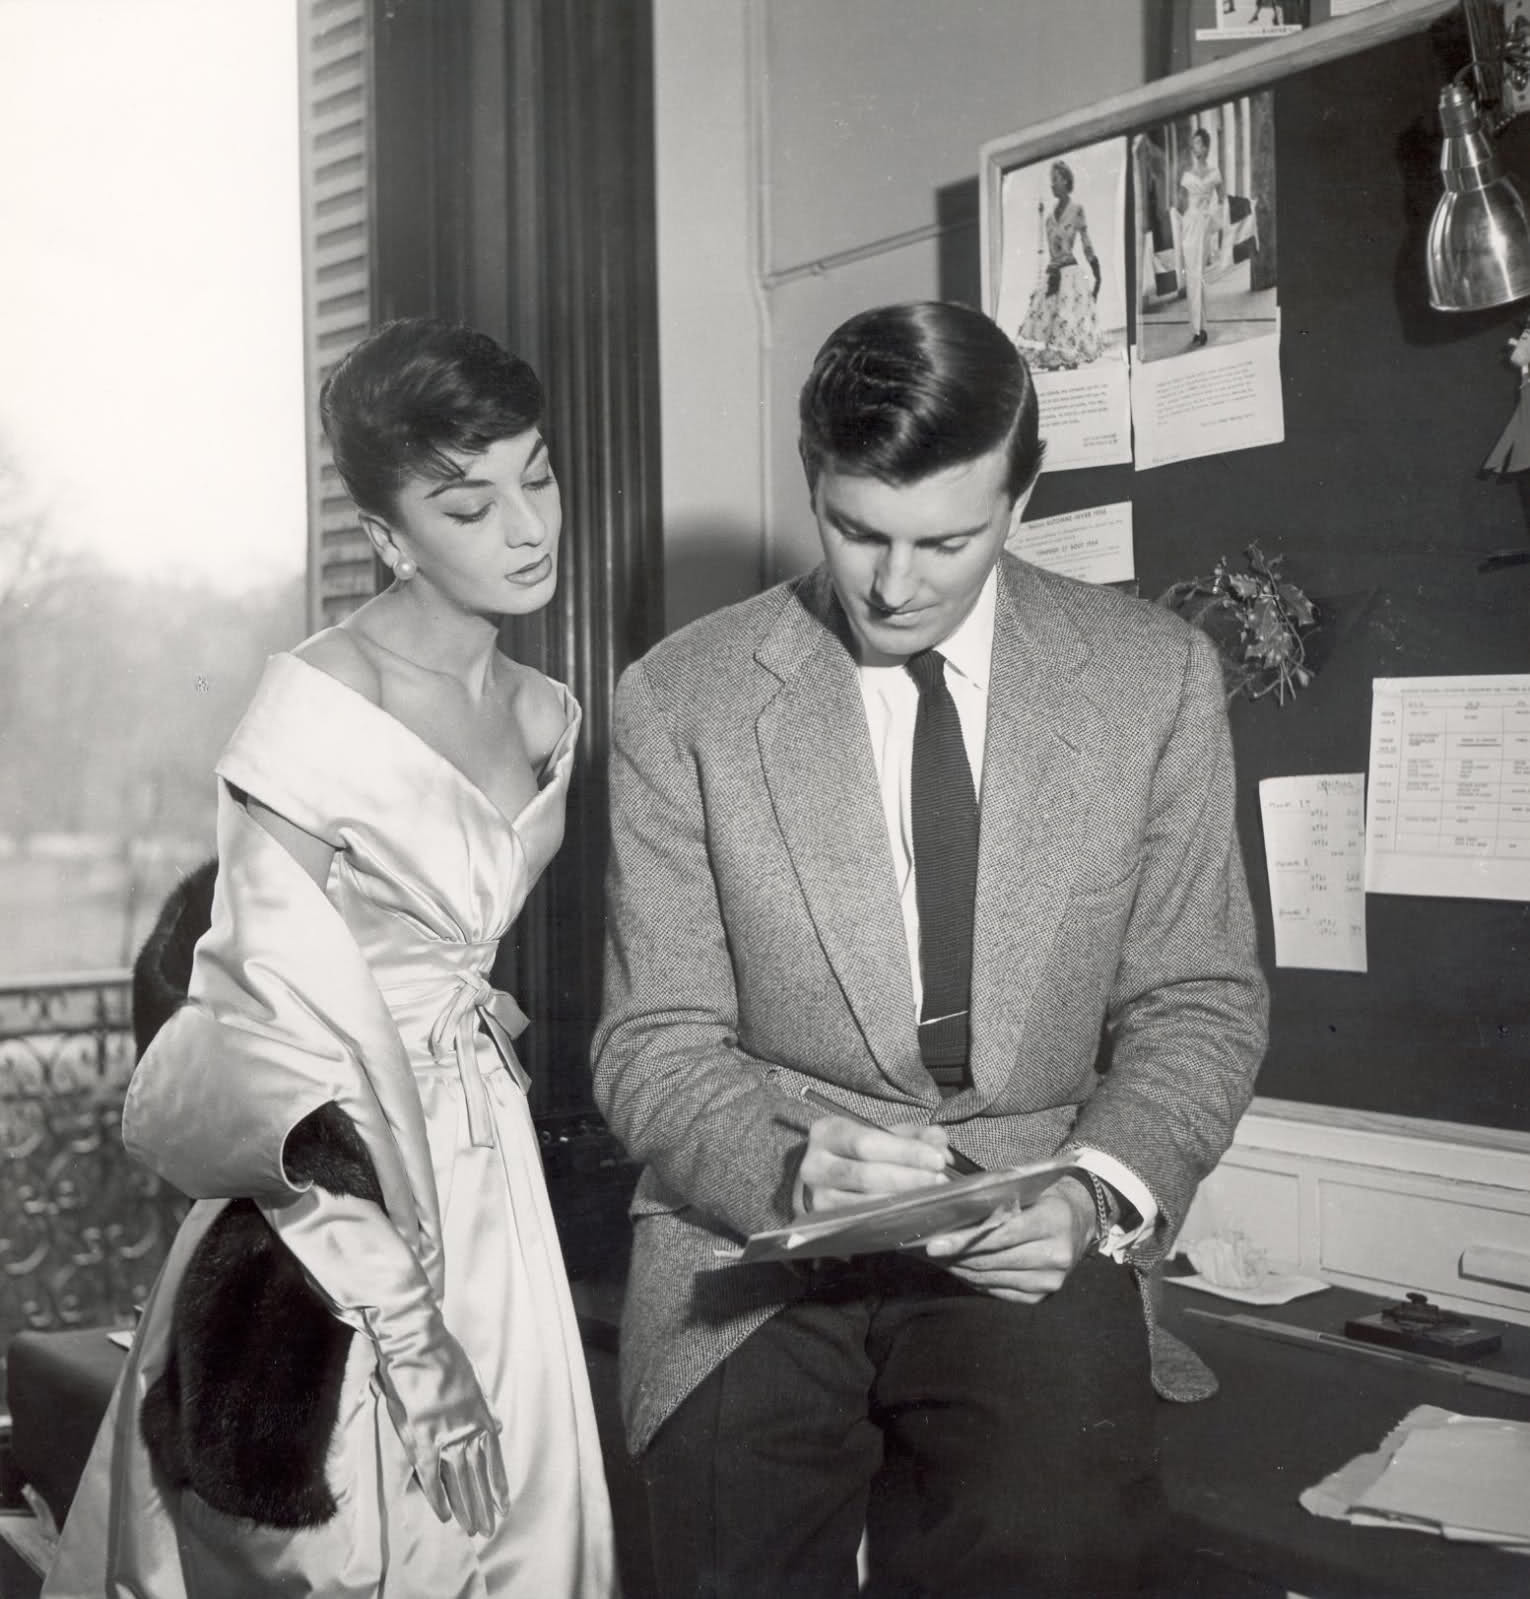 Audrey Hepburn with Hubert de Givenchy. Image: The Gloss Magazine